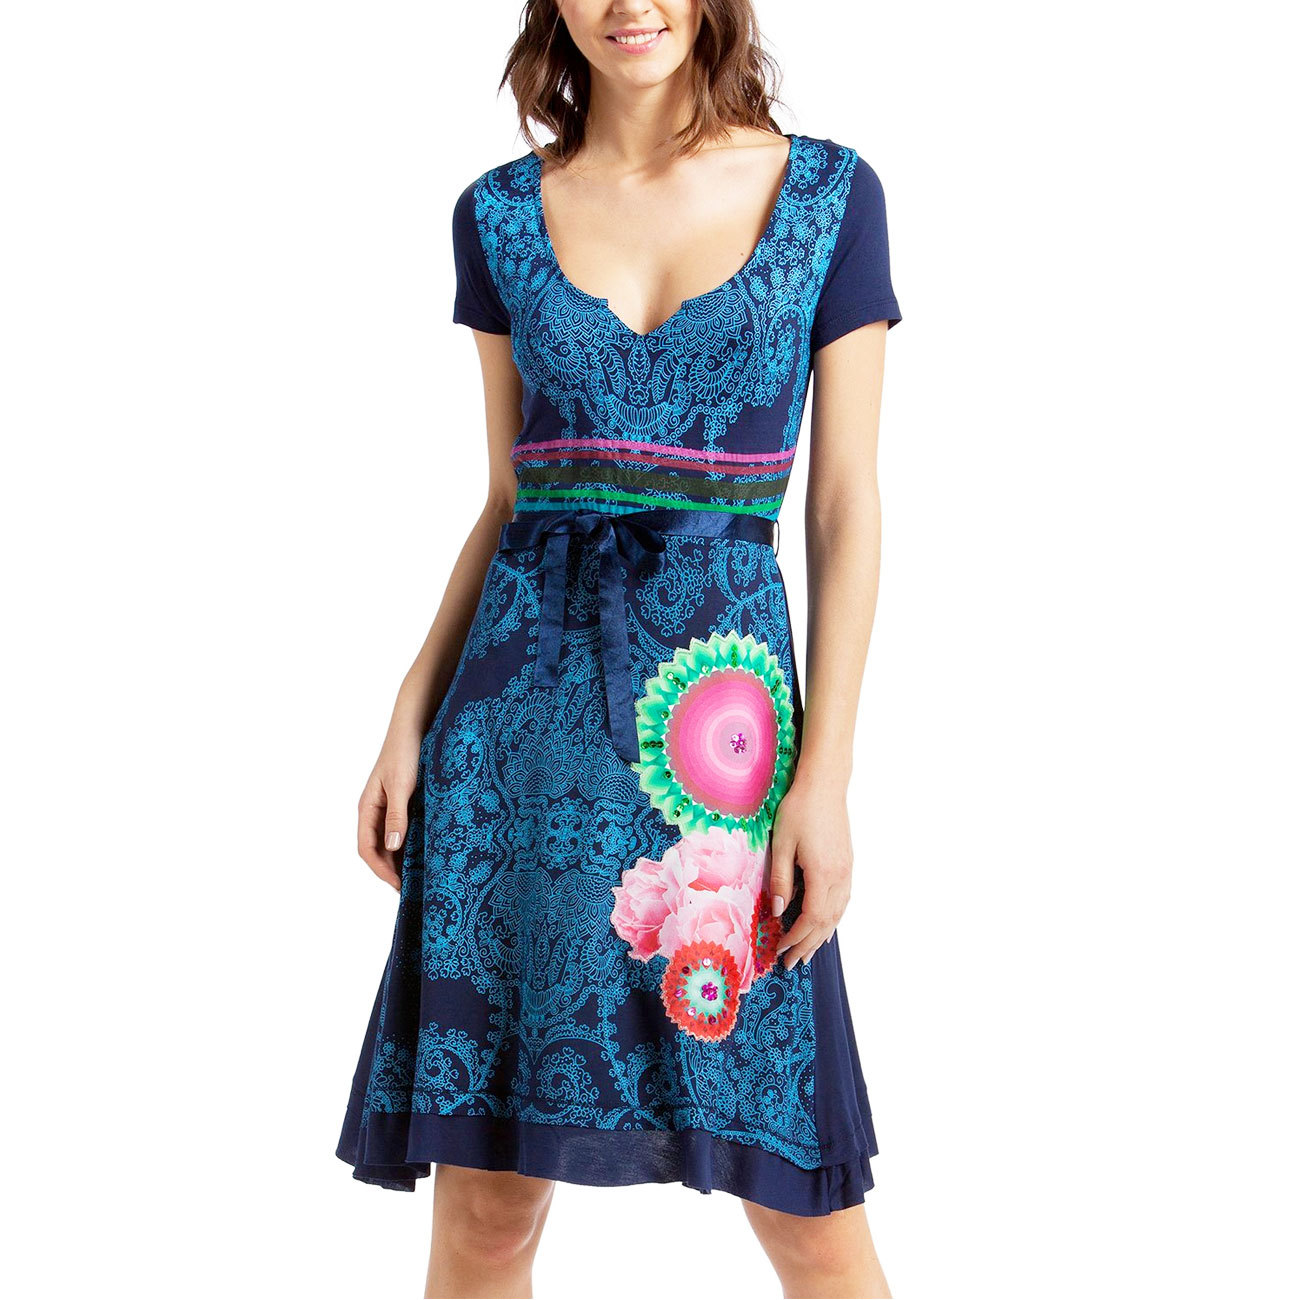 desigual damen kleid vest lorena rep blau marino 5001. Black Bedroom Furniture Sets. Home Design Ideas